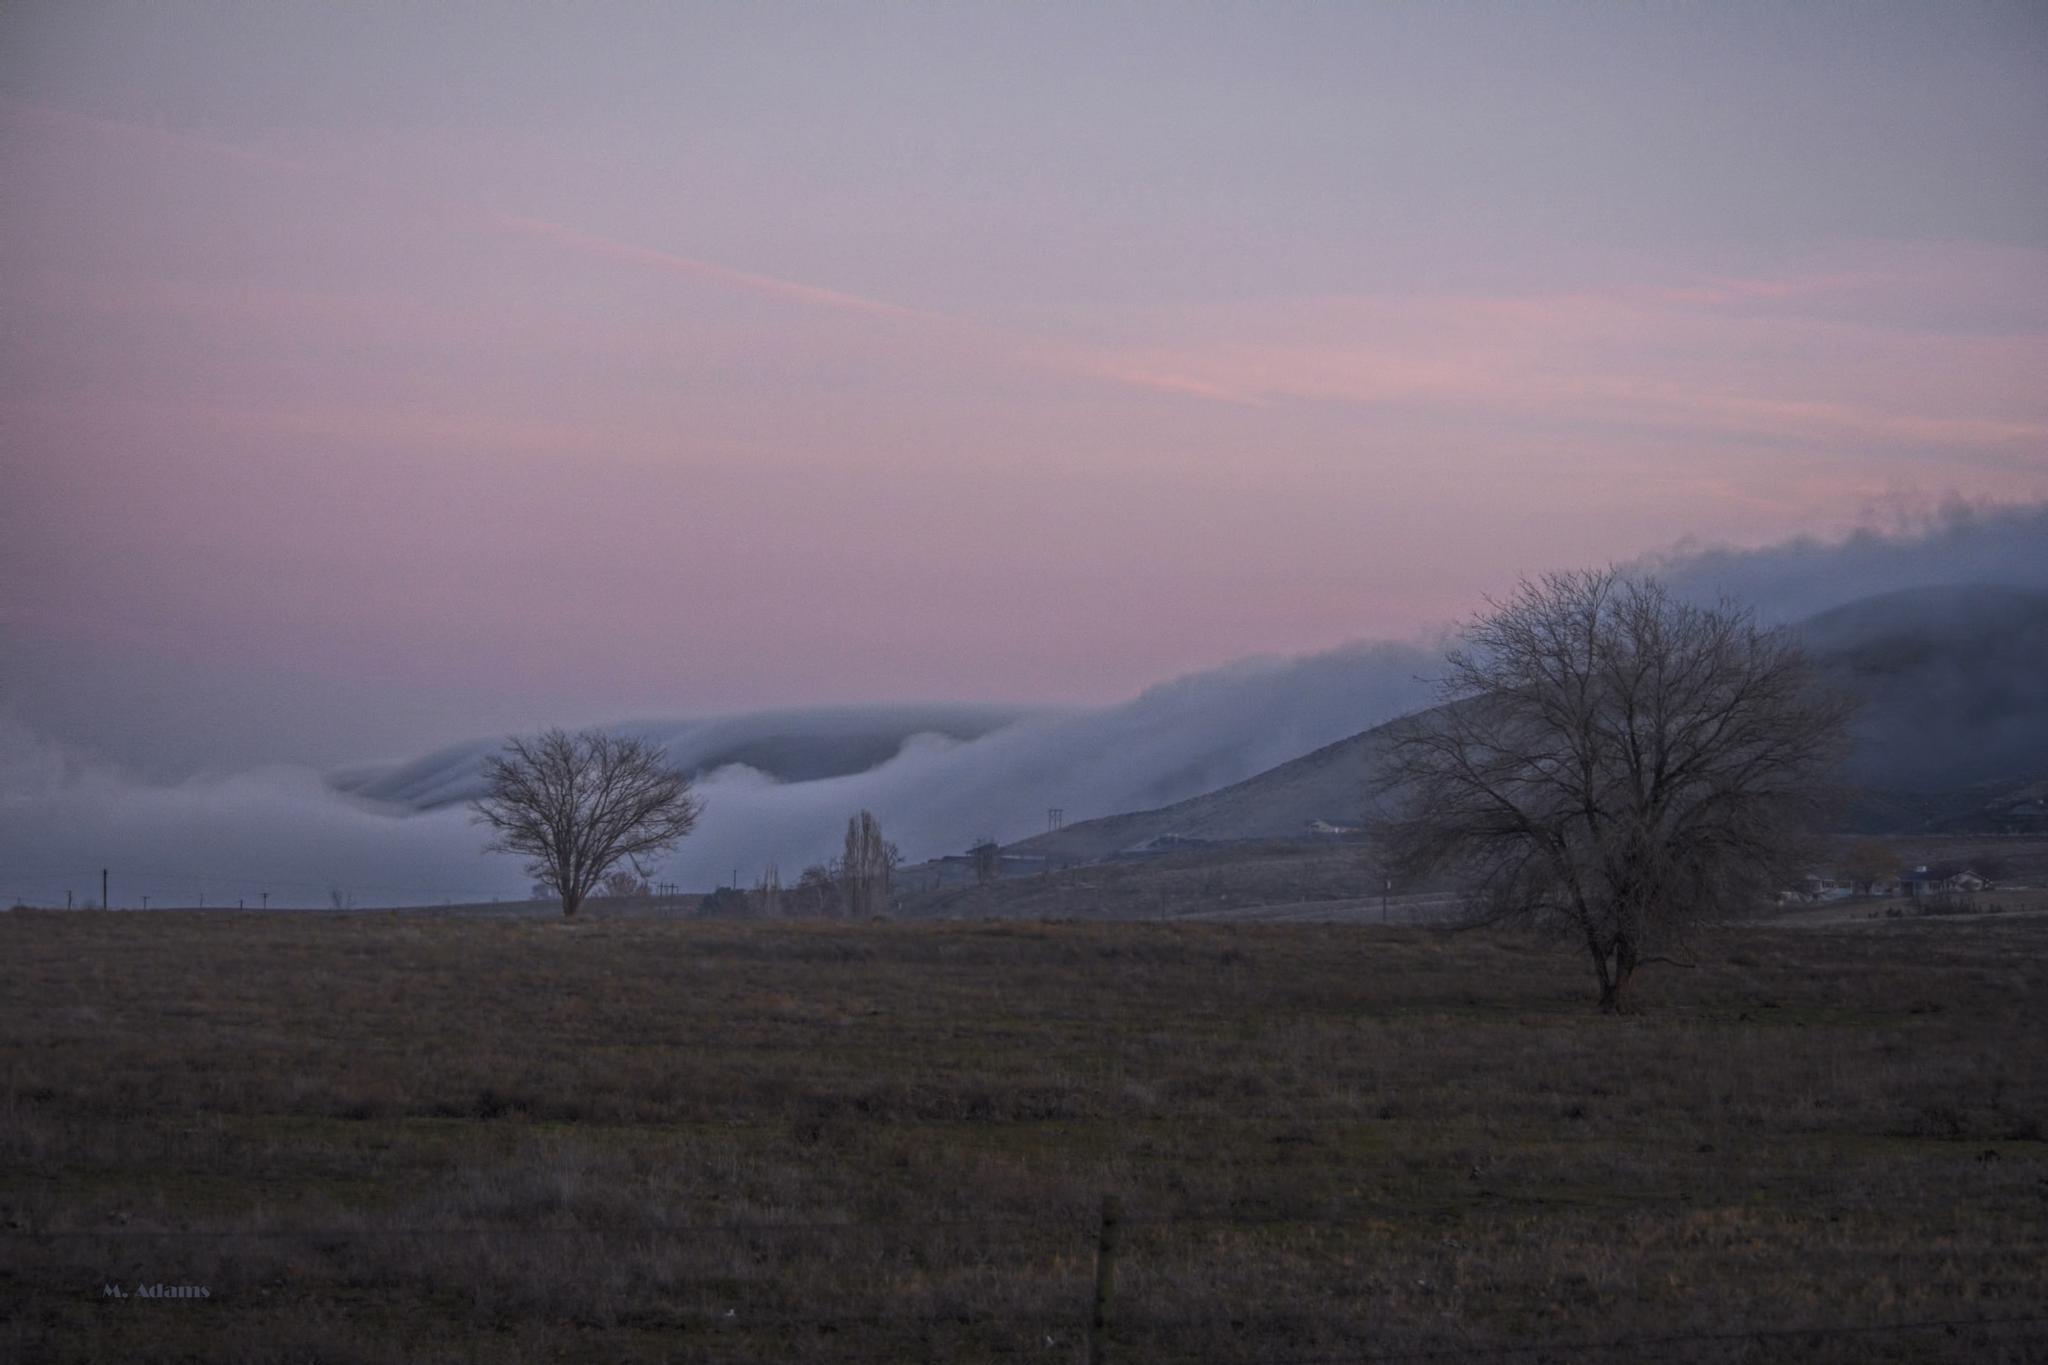 Rolling Fog by Mike Adams